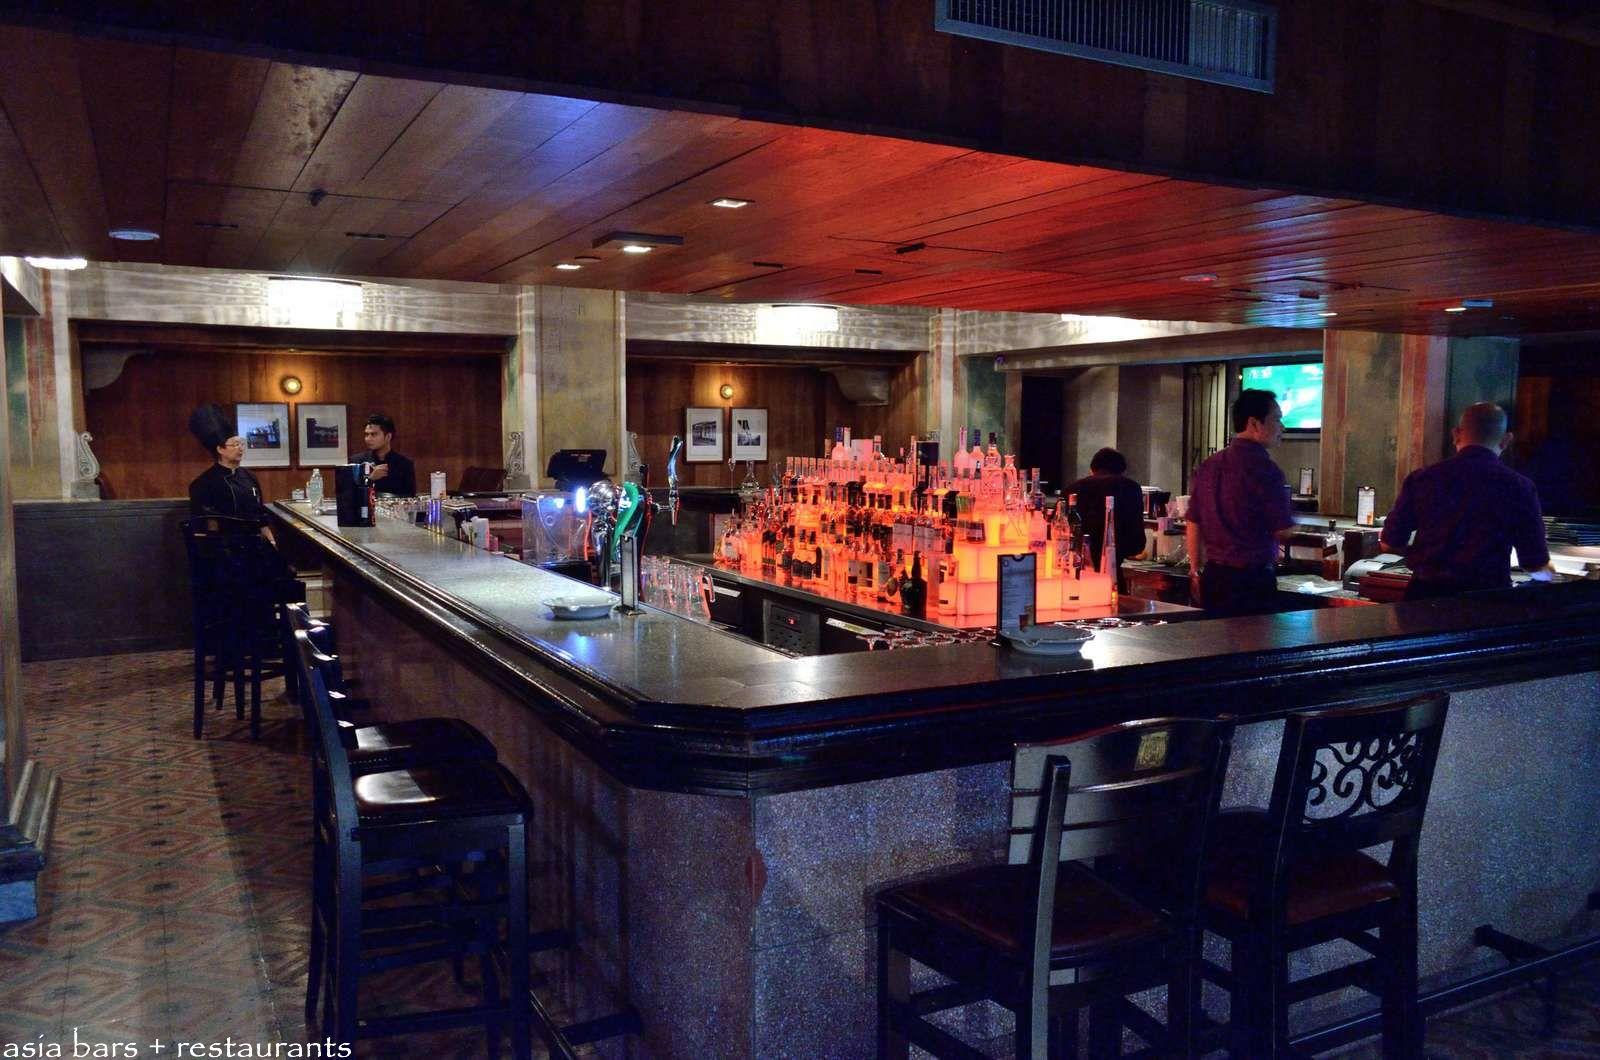 Qba Latin Bar & Grill – at The Westin Kuala Lumpur | Asia